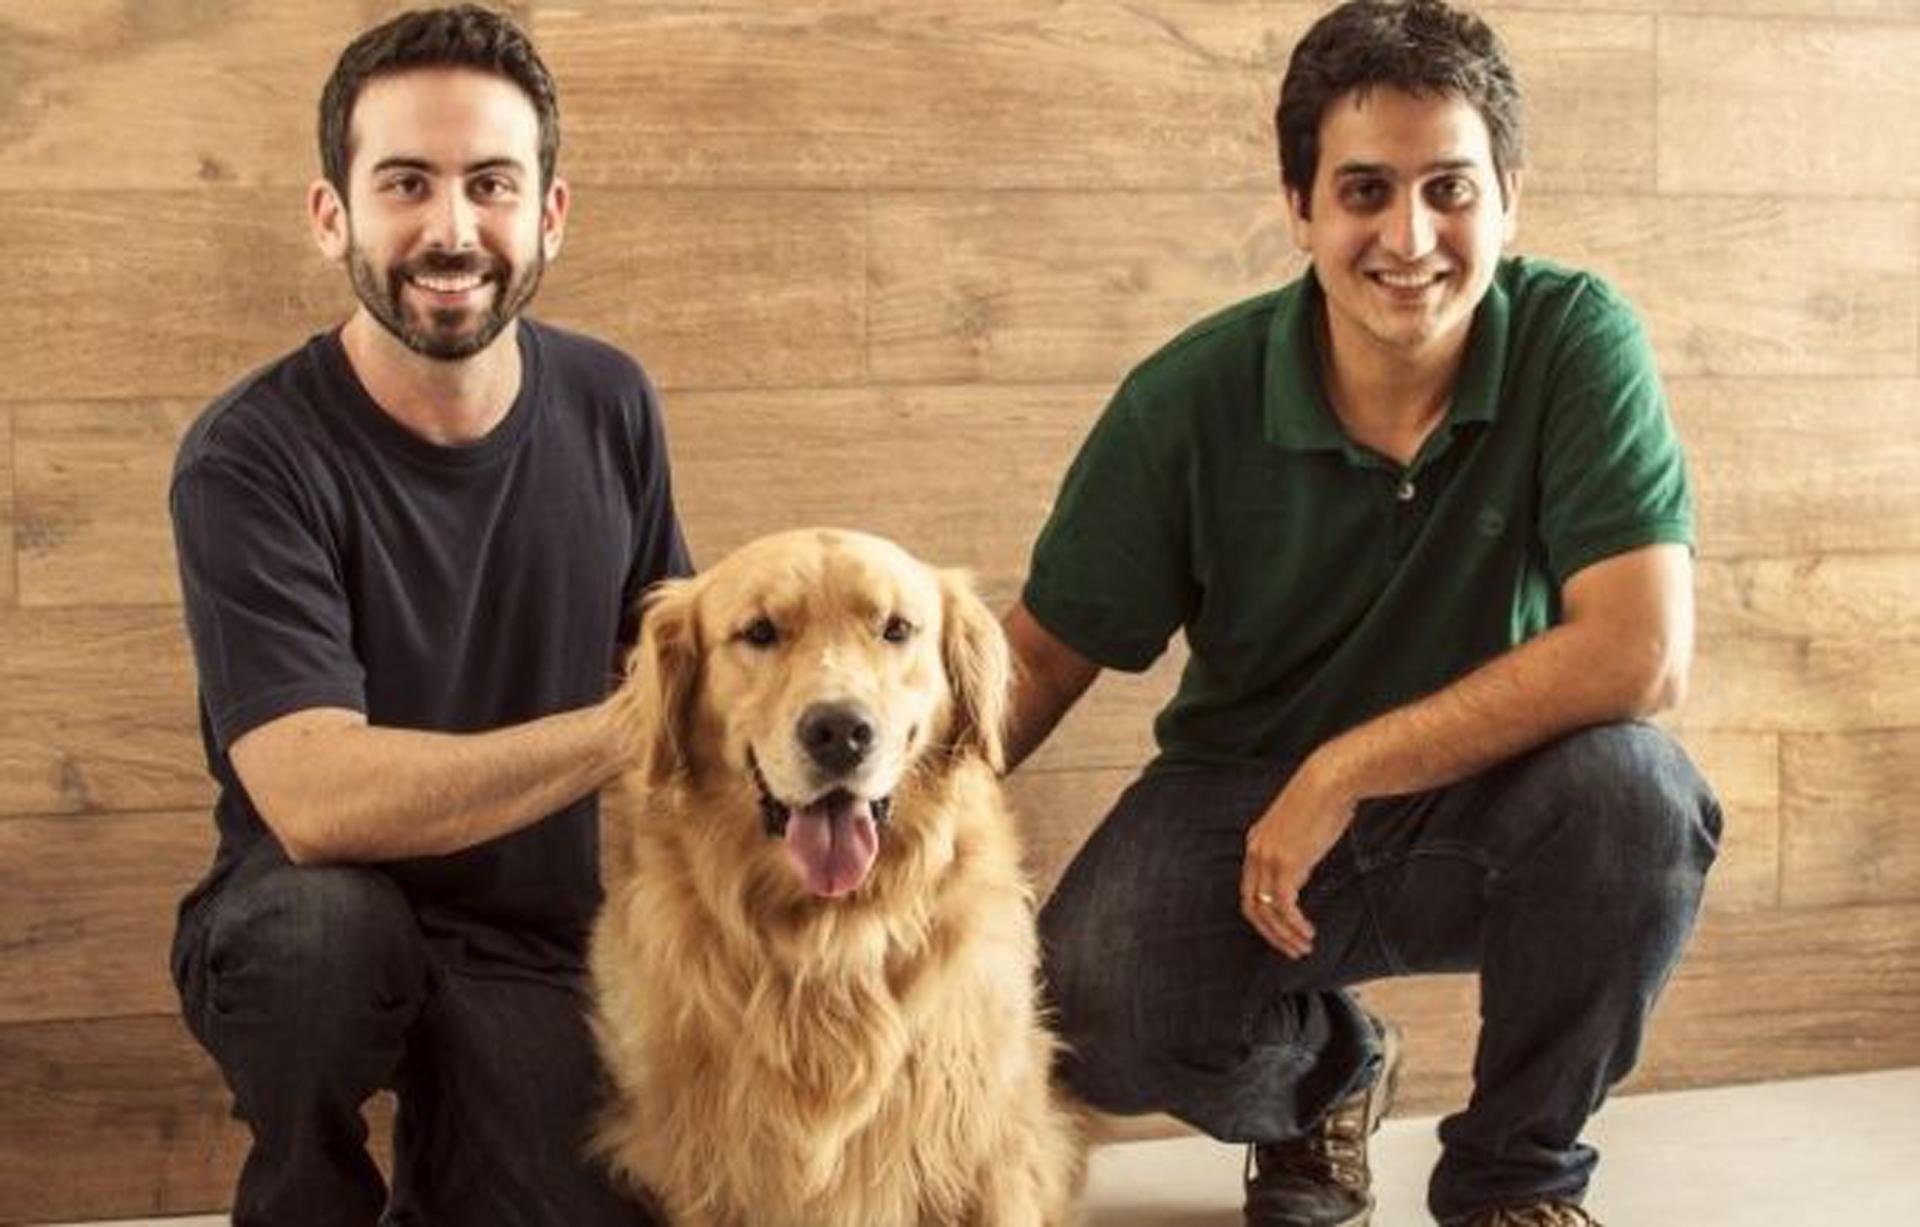 Fernando Gadotti y Eduardo Baer, fundadores de DogHero Brasil (Kaszek)